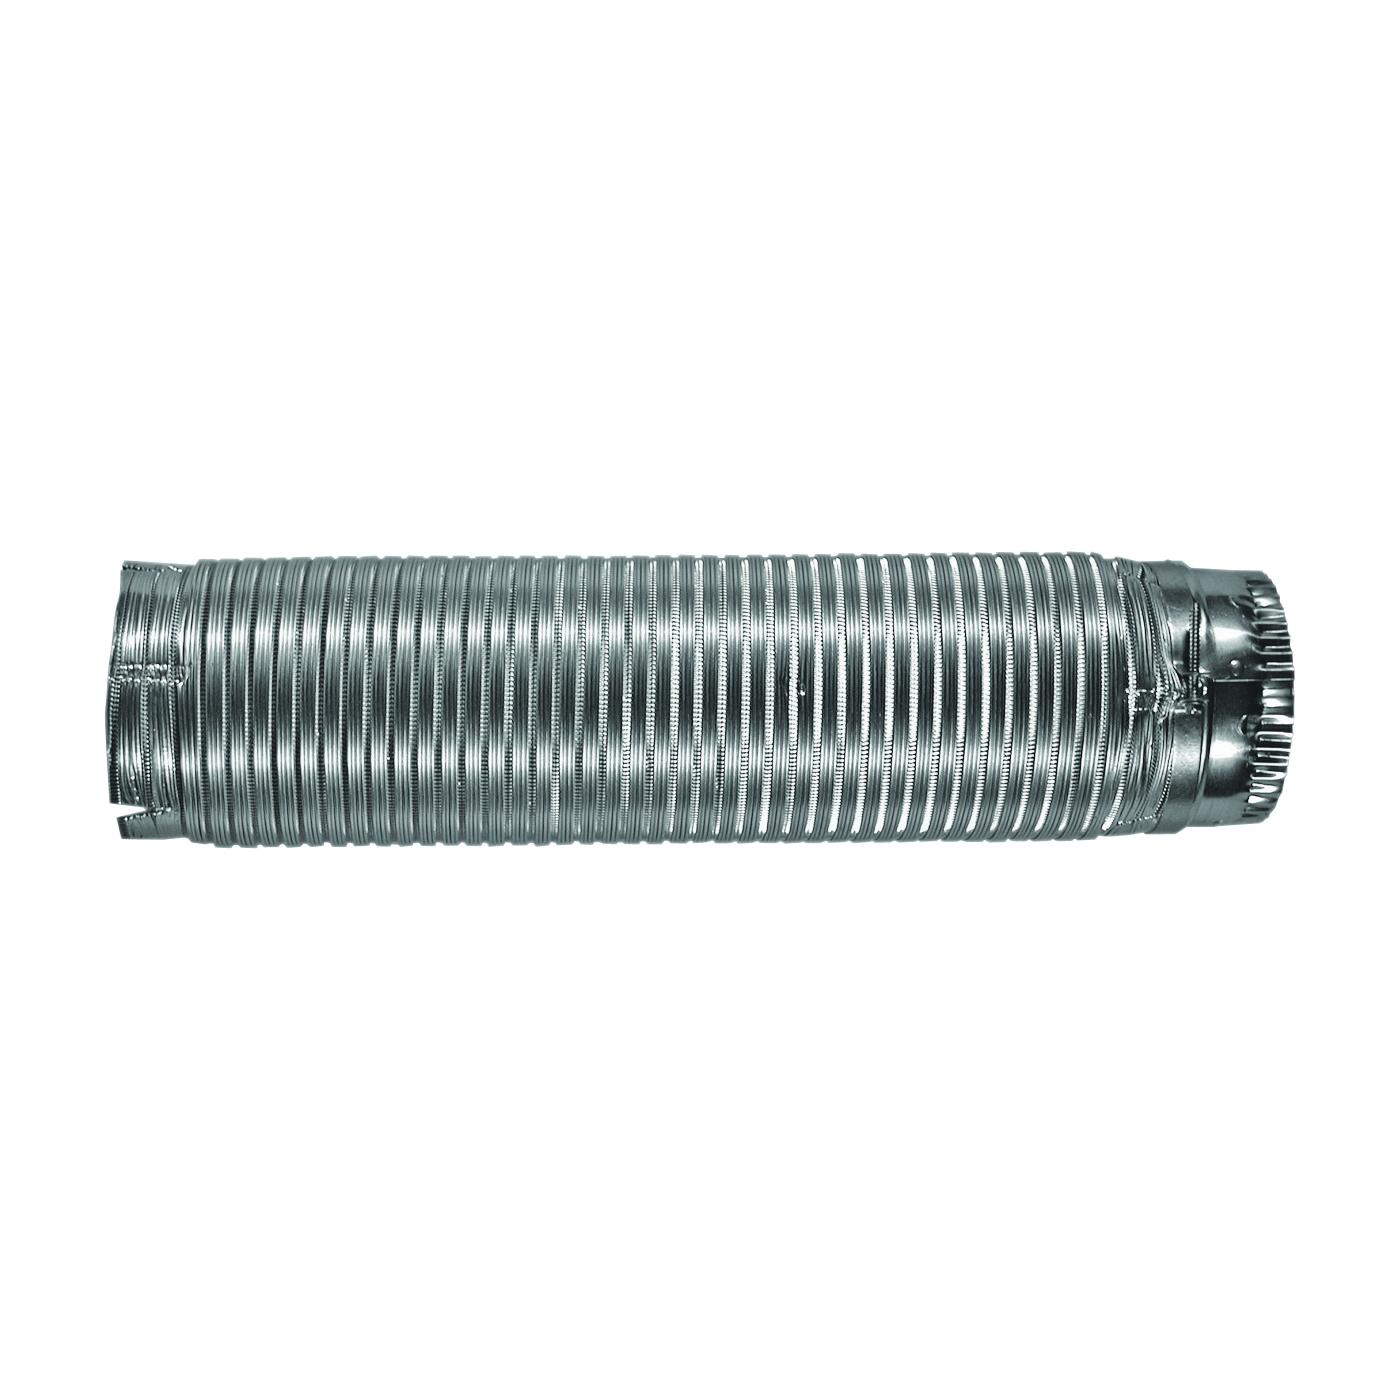 Picture of BUILDER'S BEST E-Z-Fasten 010150 Flexible Dryer Vent Pipe Male Snap-Lock, 5 ft L, Aluminum